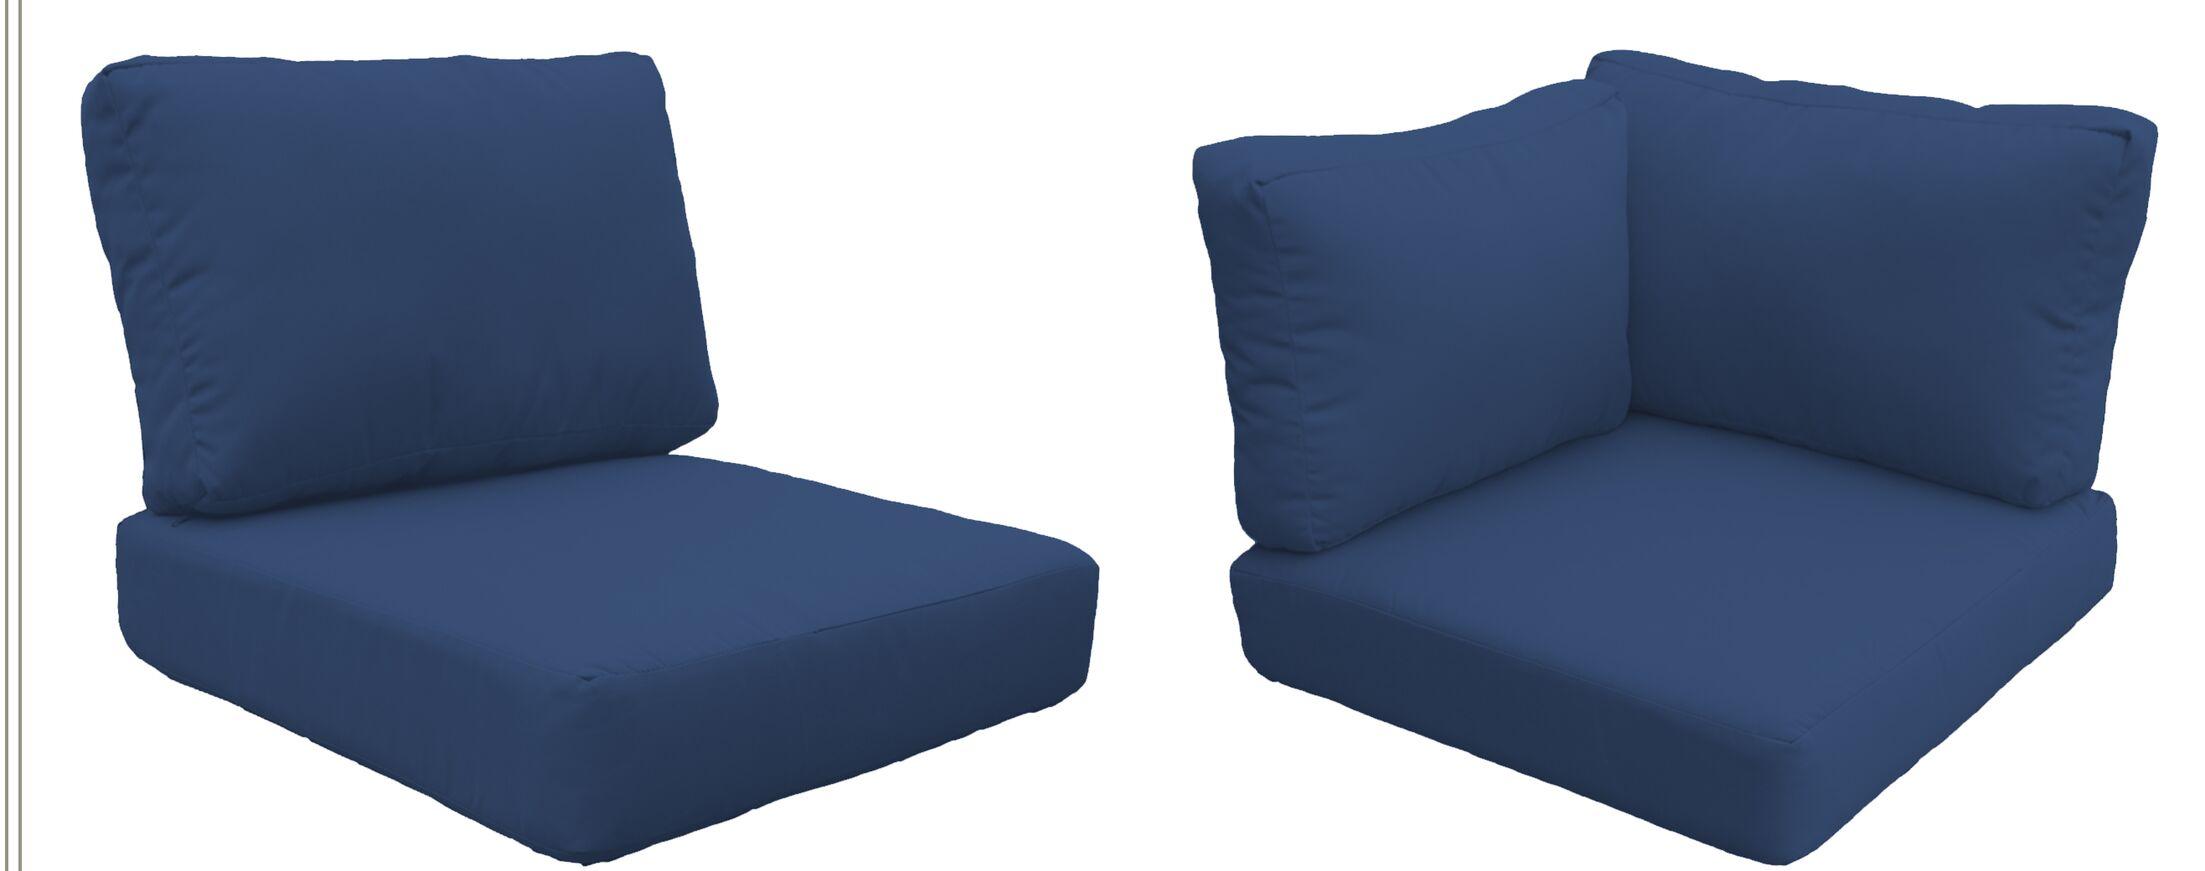 Barbados 24 Piece Outdoor Cushion Set Fabric: Navy